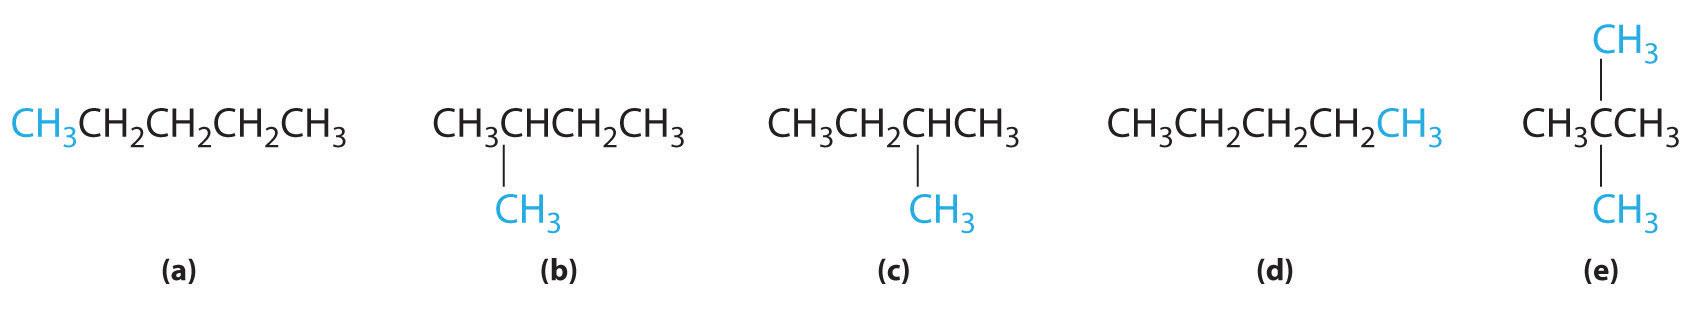 22dimethylpropane13diyl dinonanoate  Registration